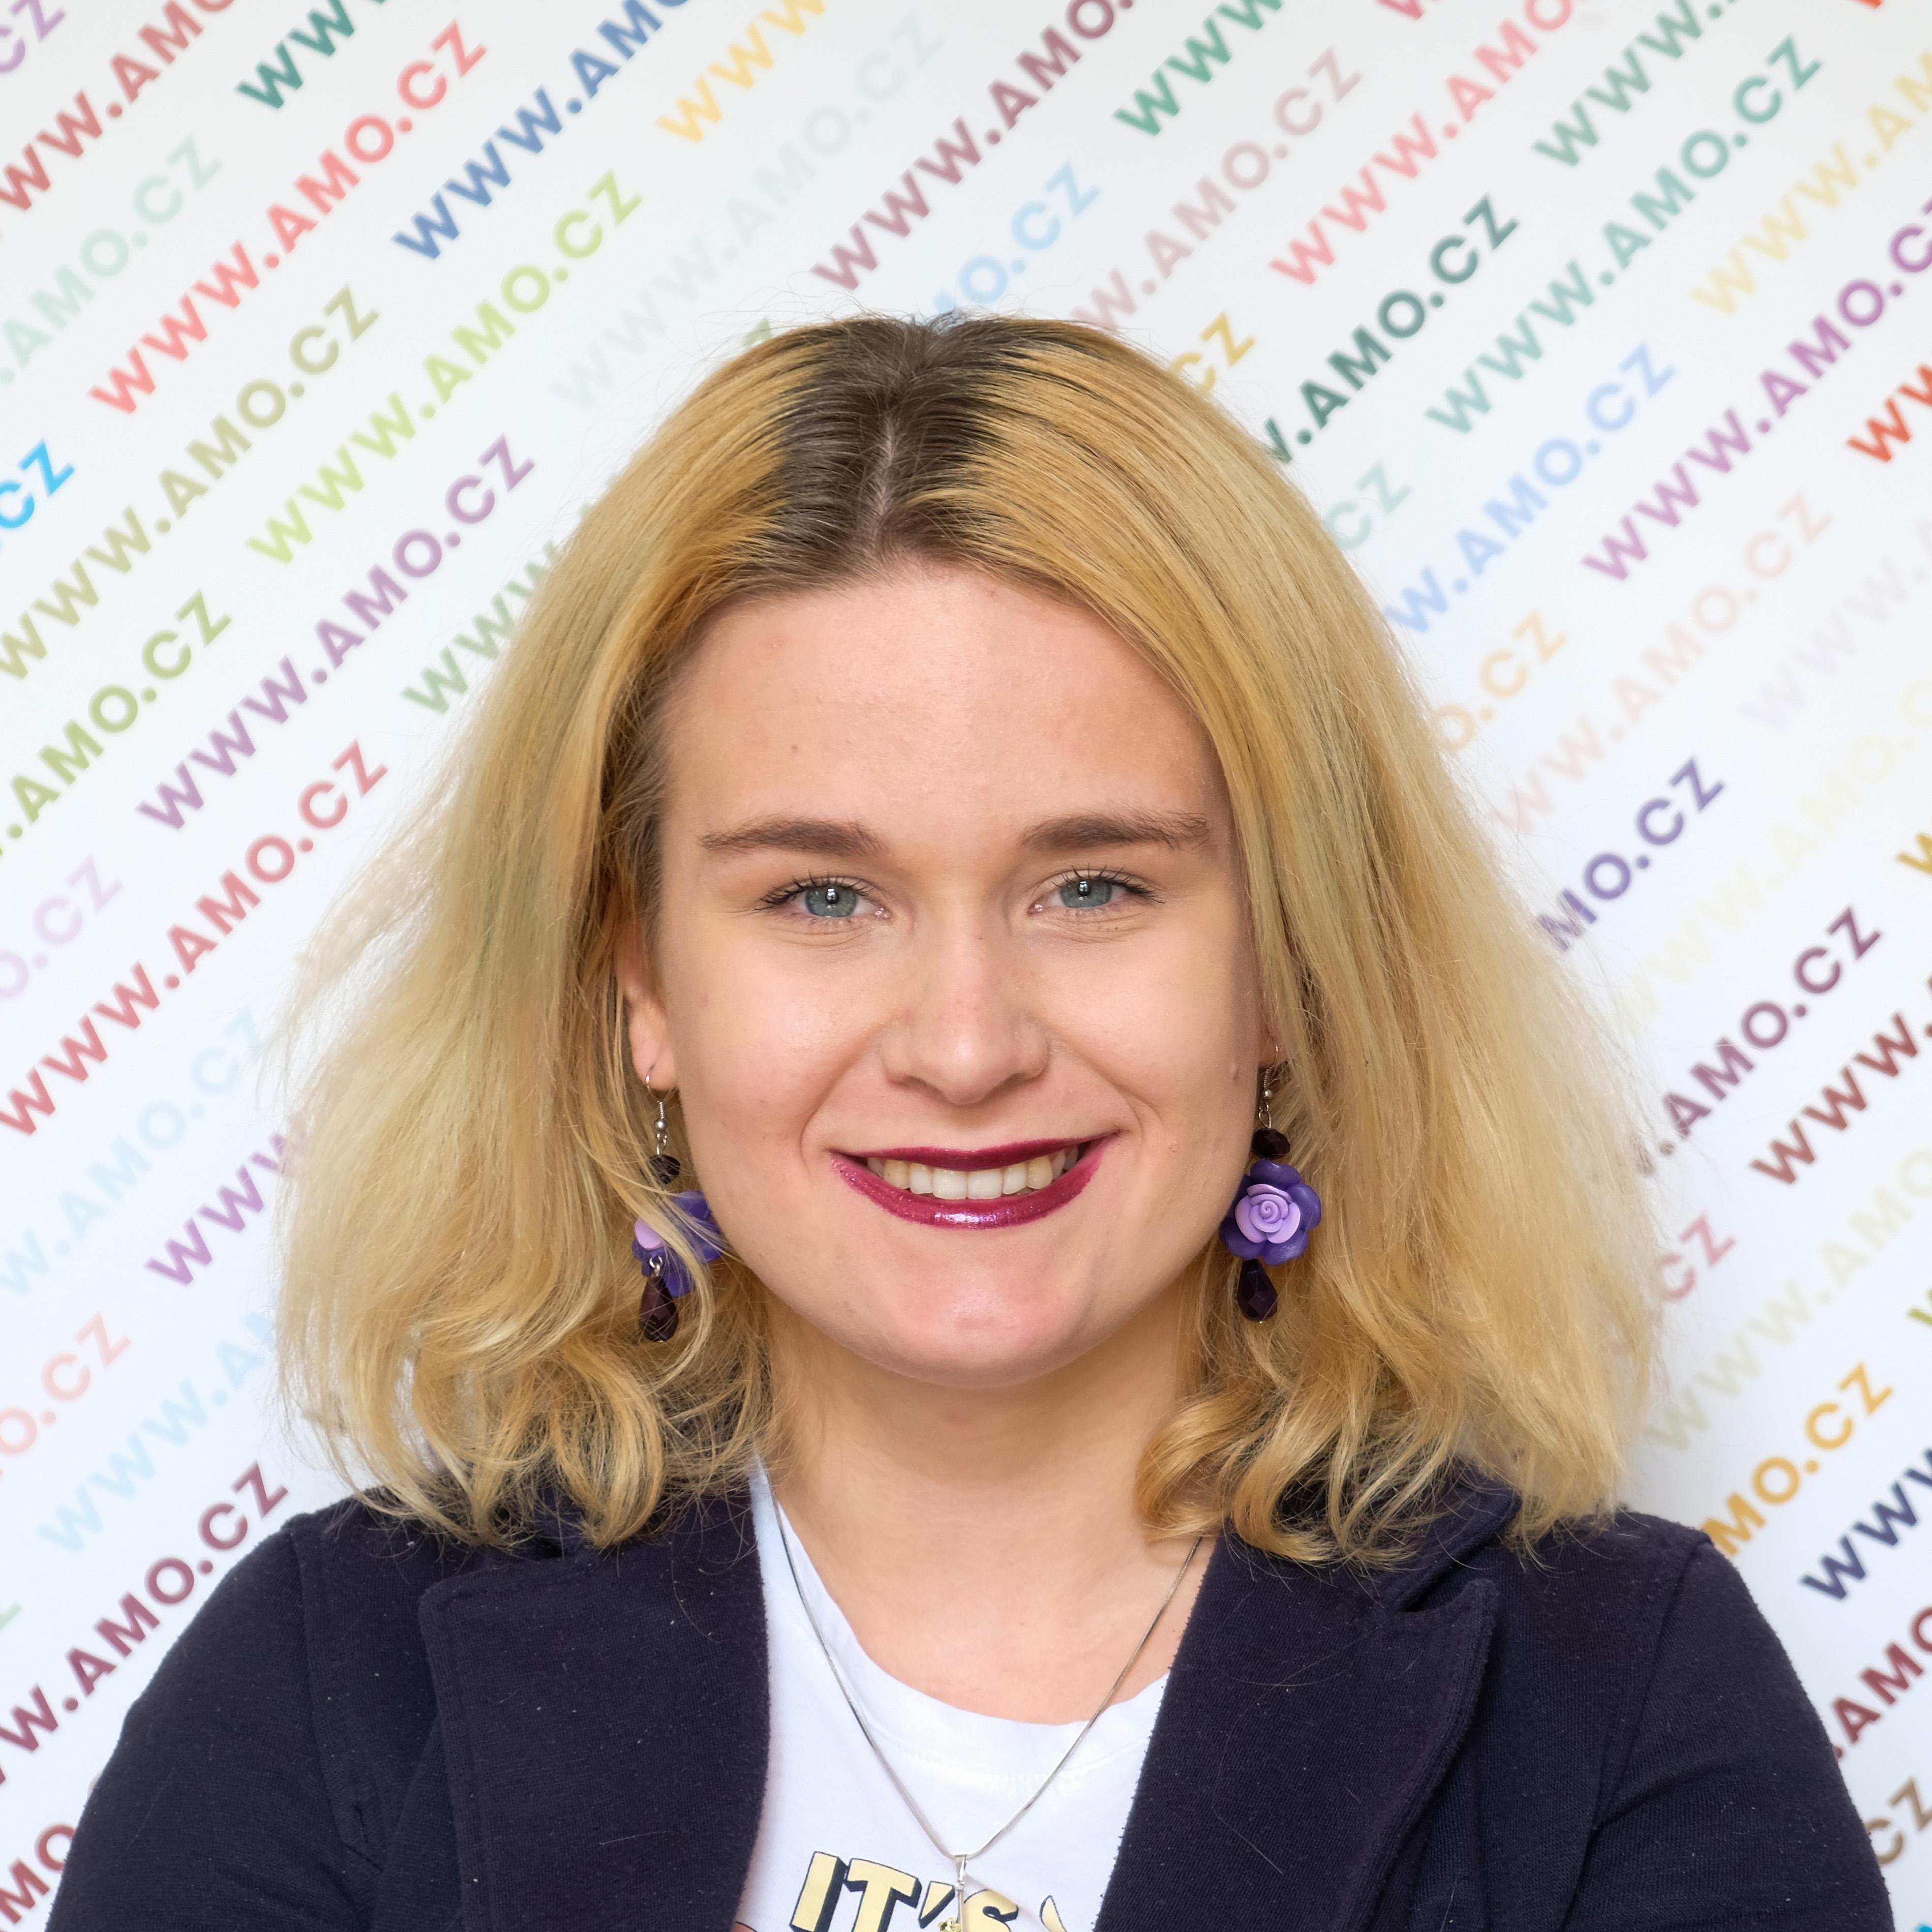 Adéla Schreiberová